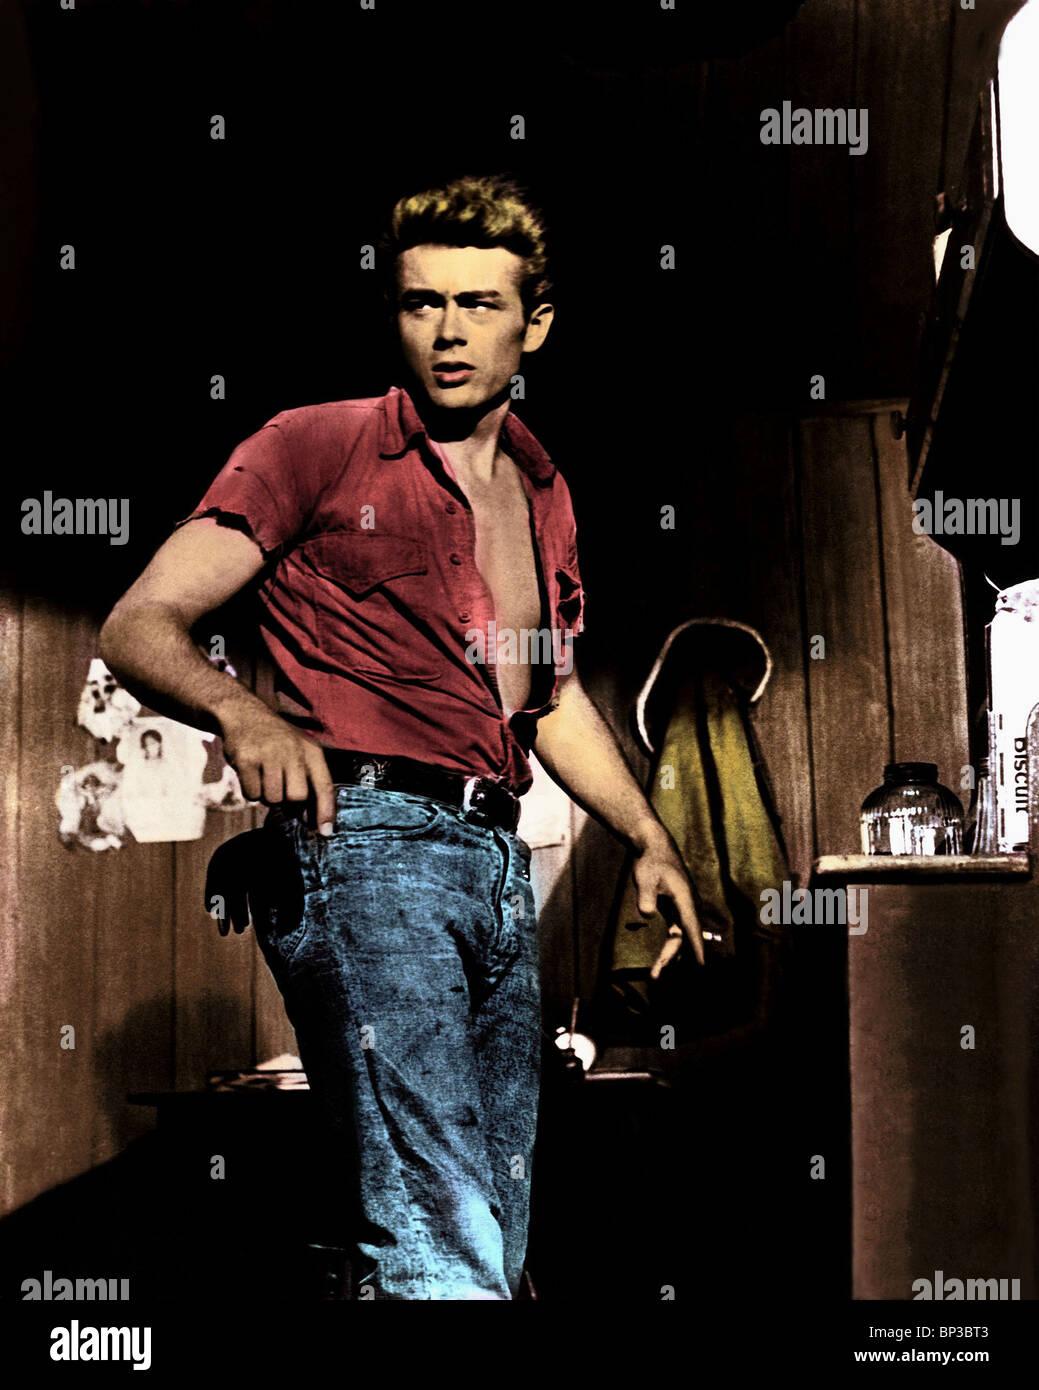 Oscar Vault Monday – Giant, 1956 (dir. George Stevens ...  Giant 1956 James Dean